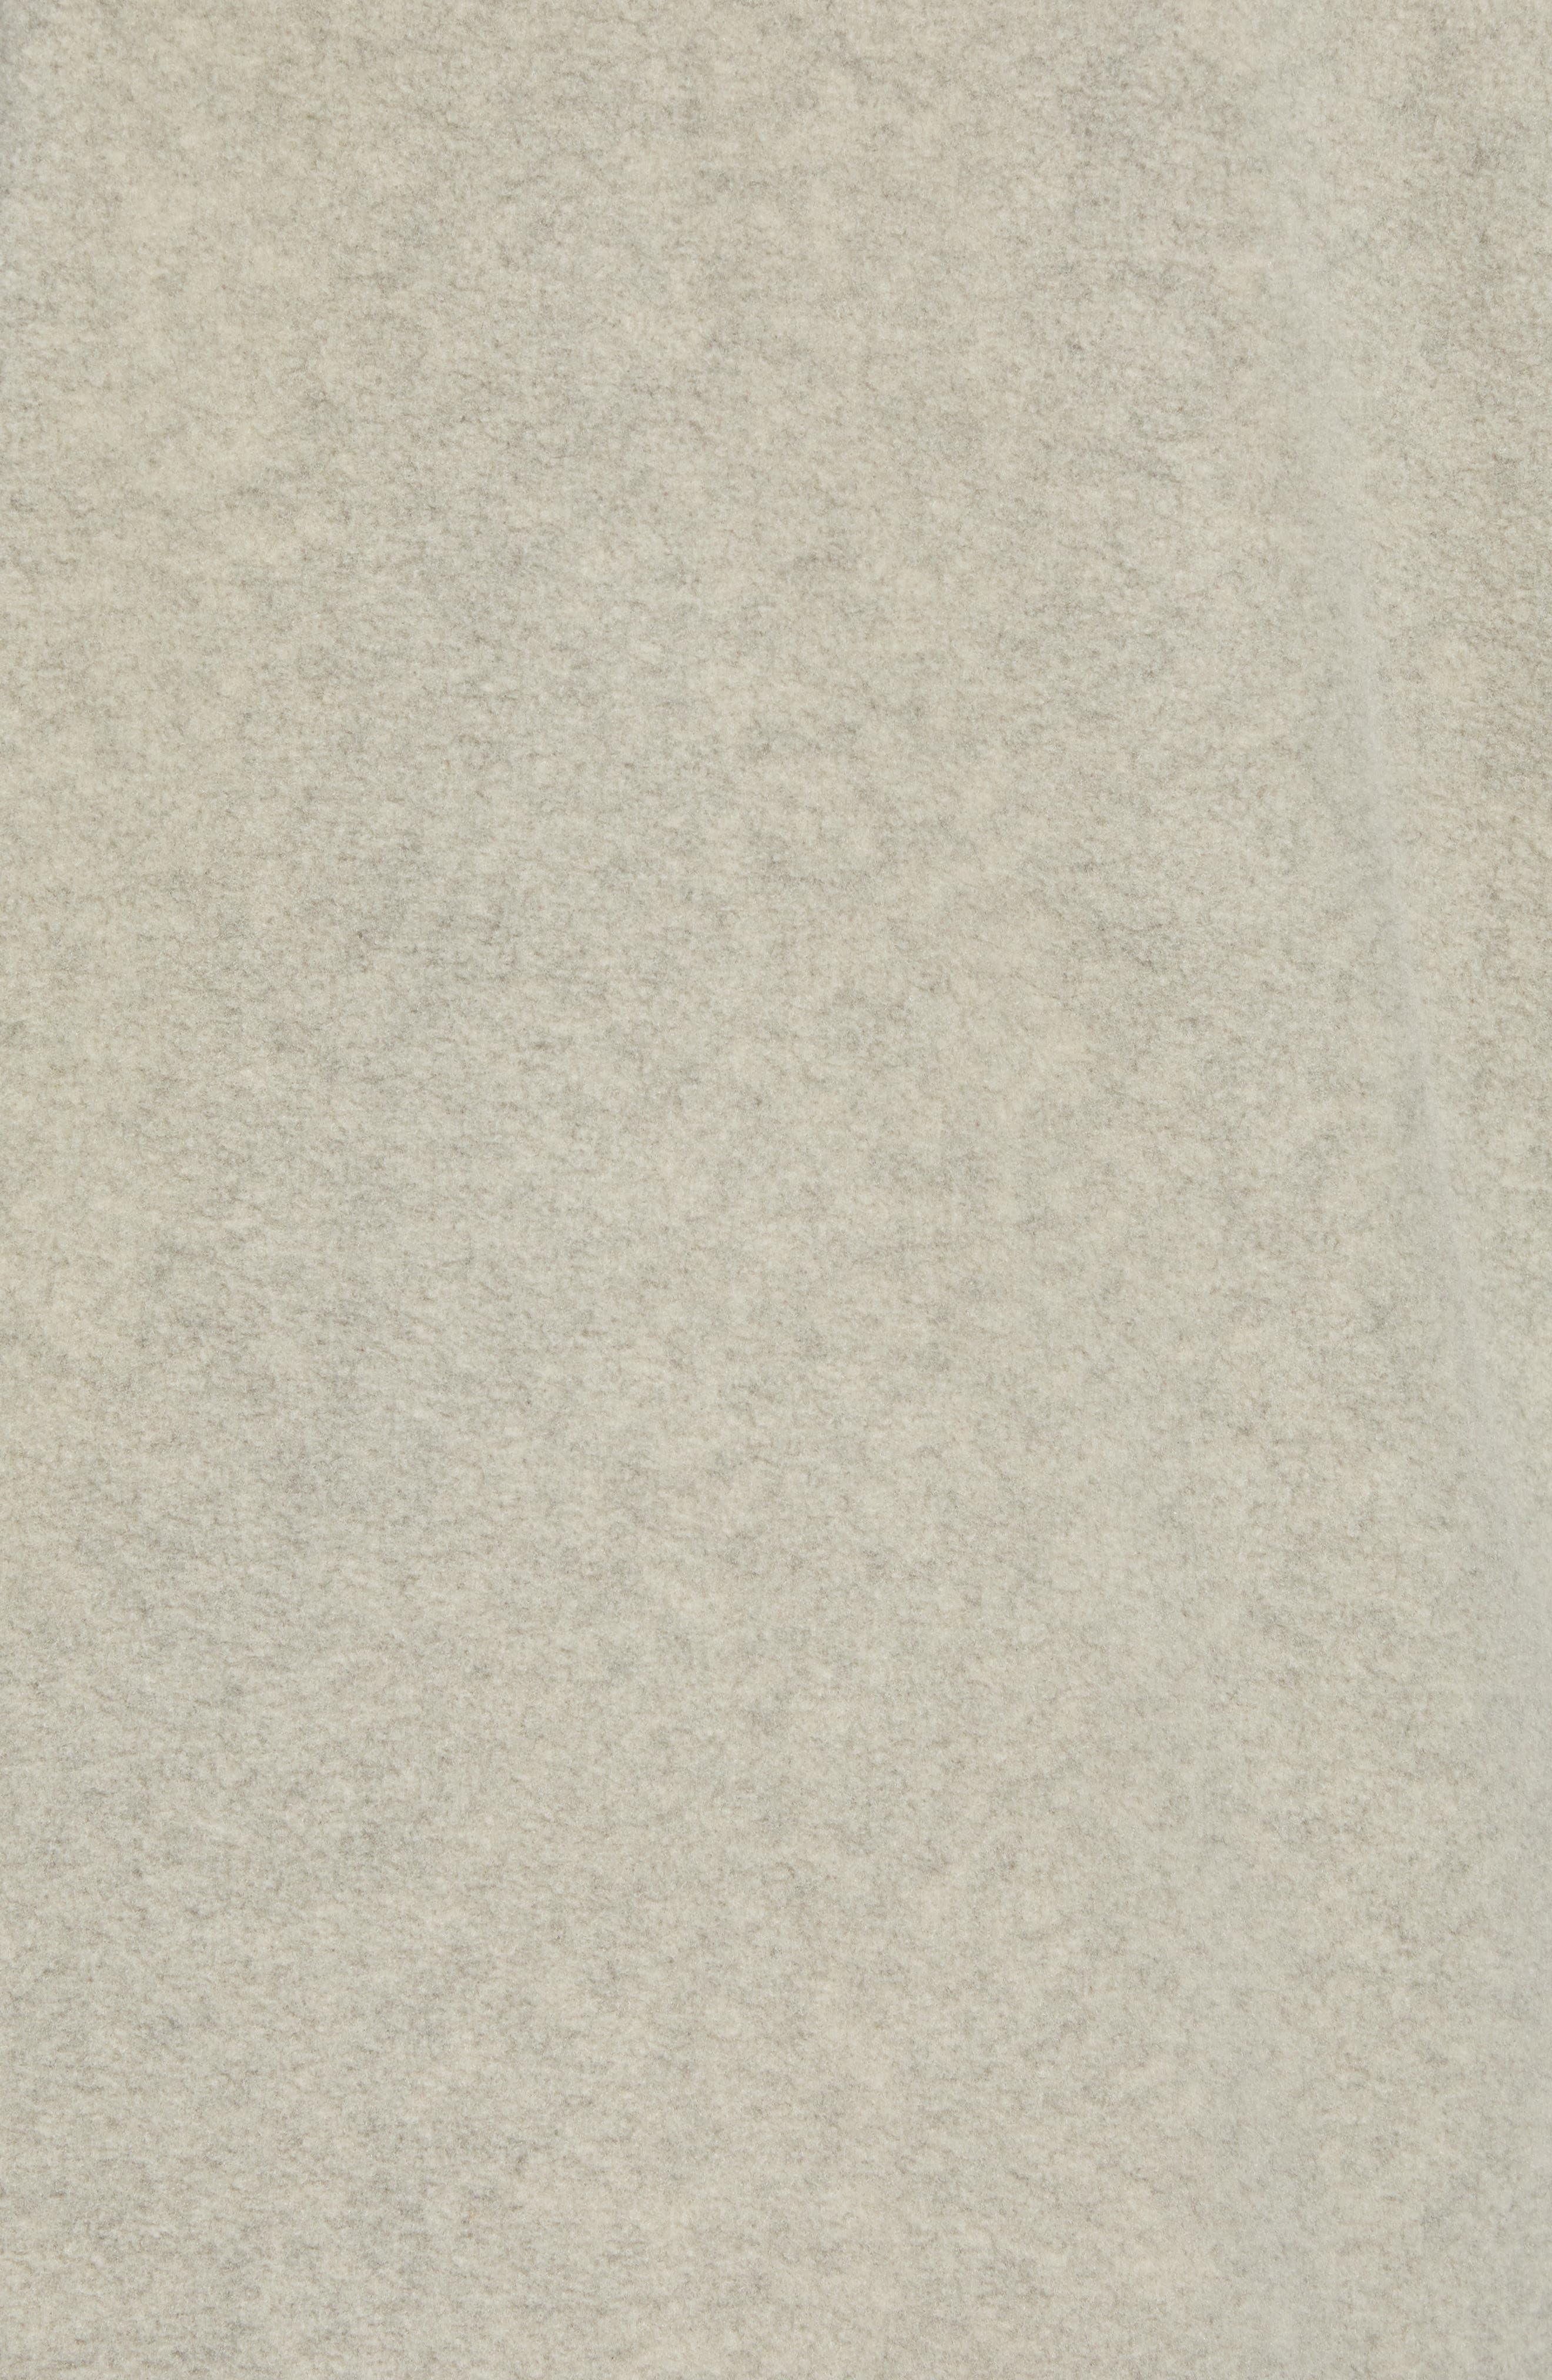 Pyrite Sweater Knit Fleece Hoodie,                             Alternate thumbnail 6, color,                             GRANITE BLUFF TAN HEATHER